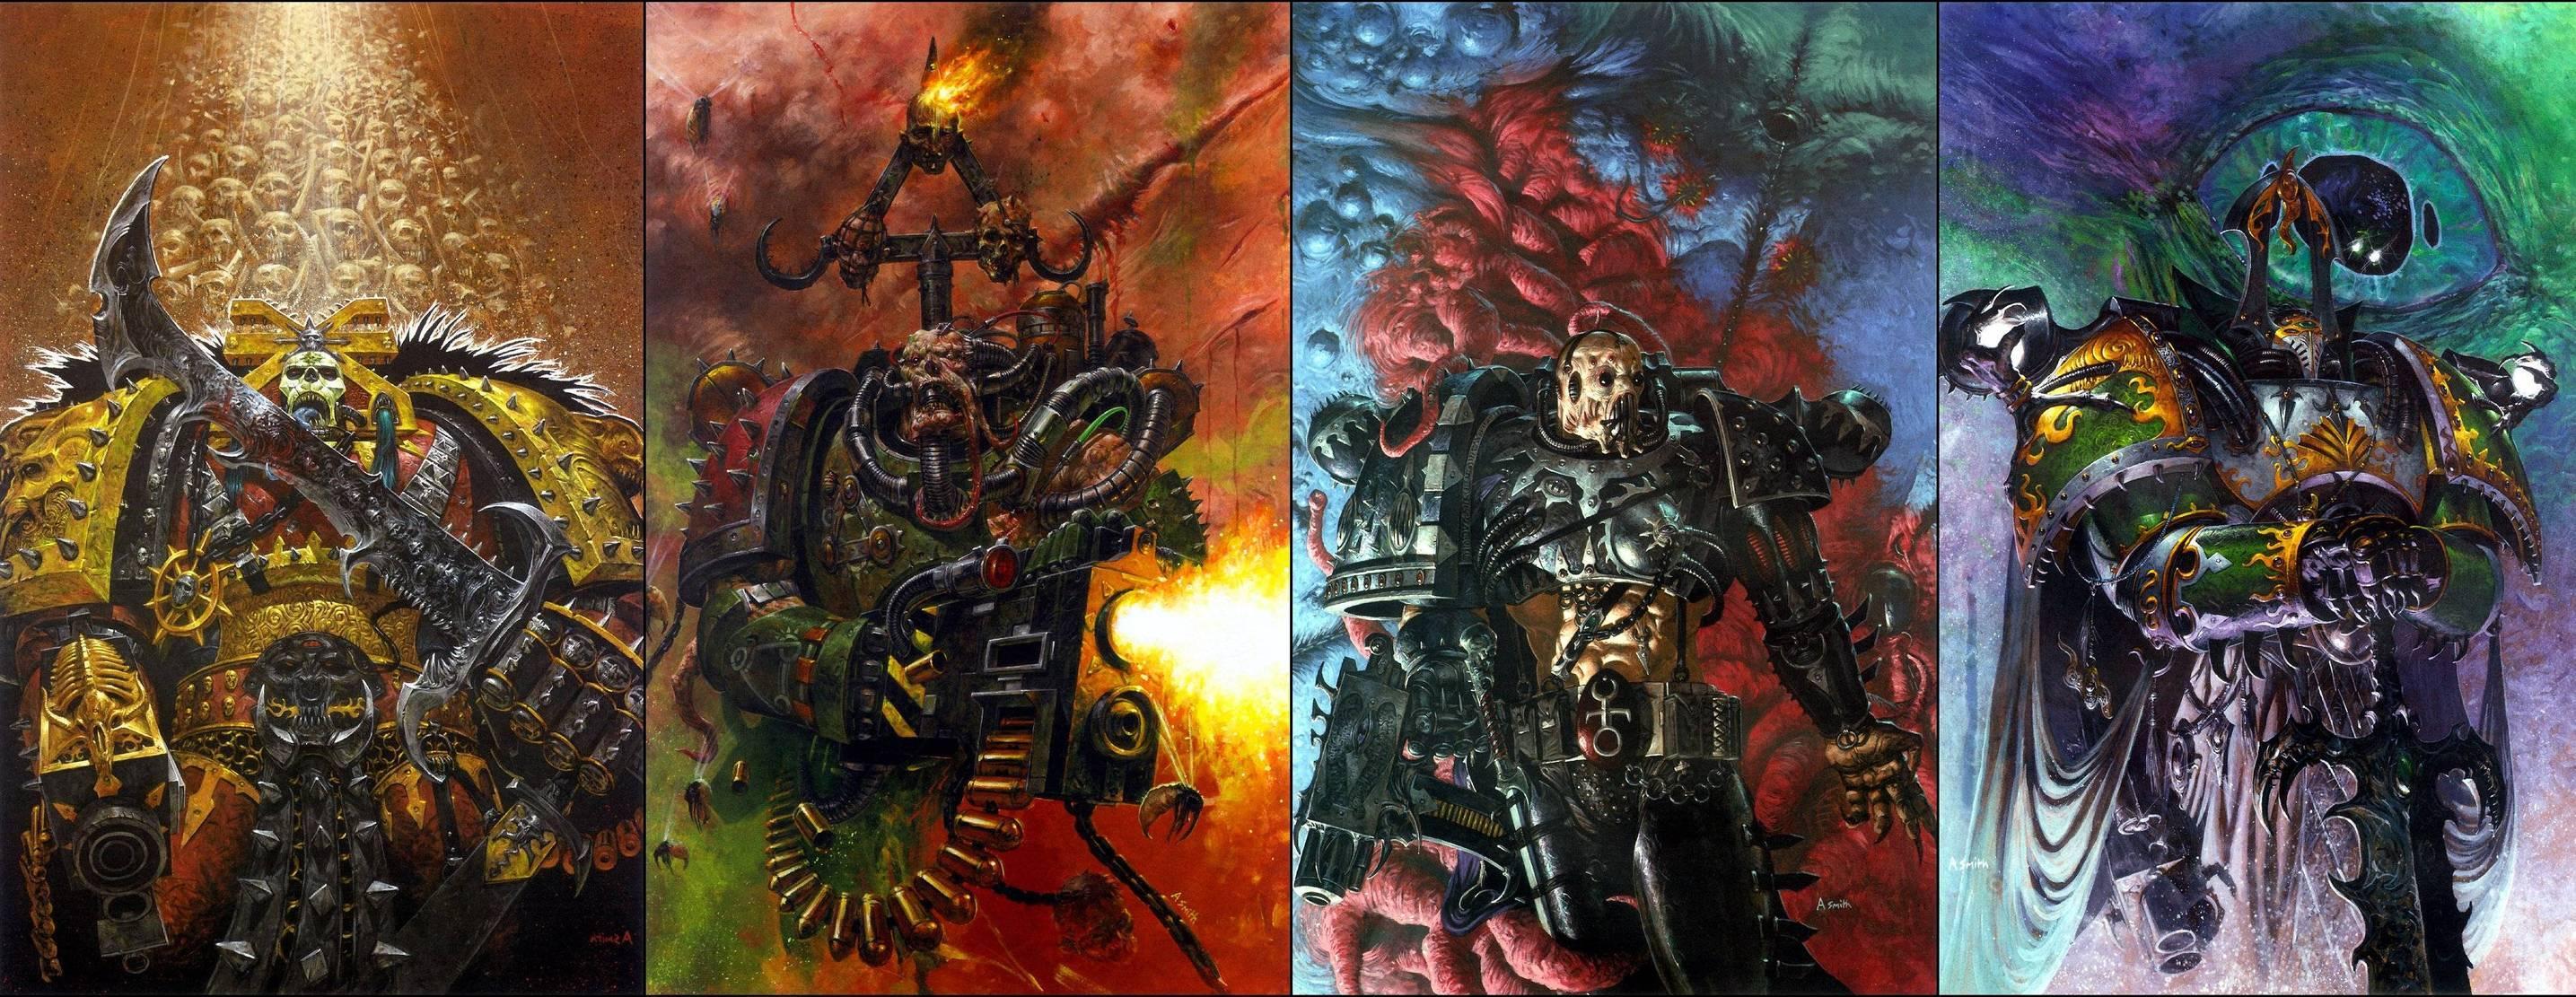 Chaos Gods (Warhammer)